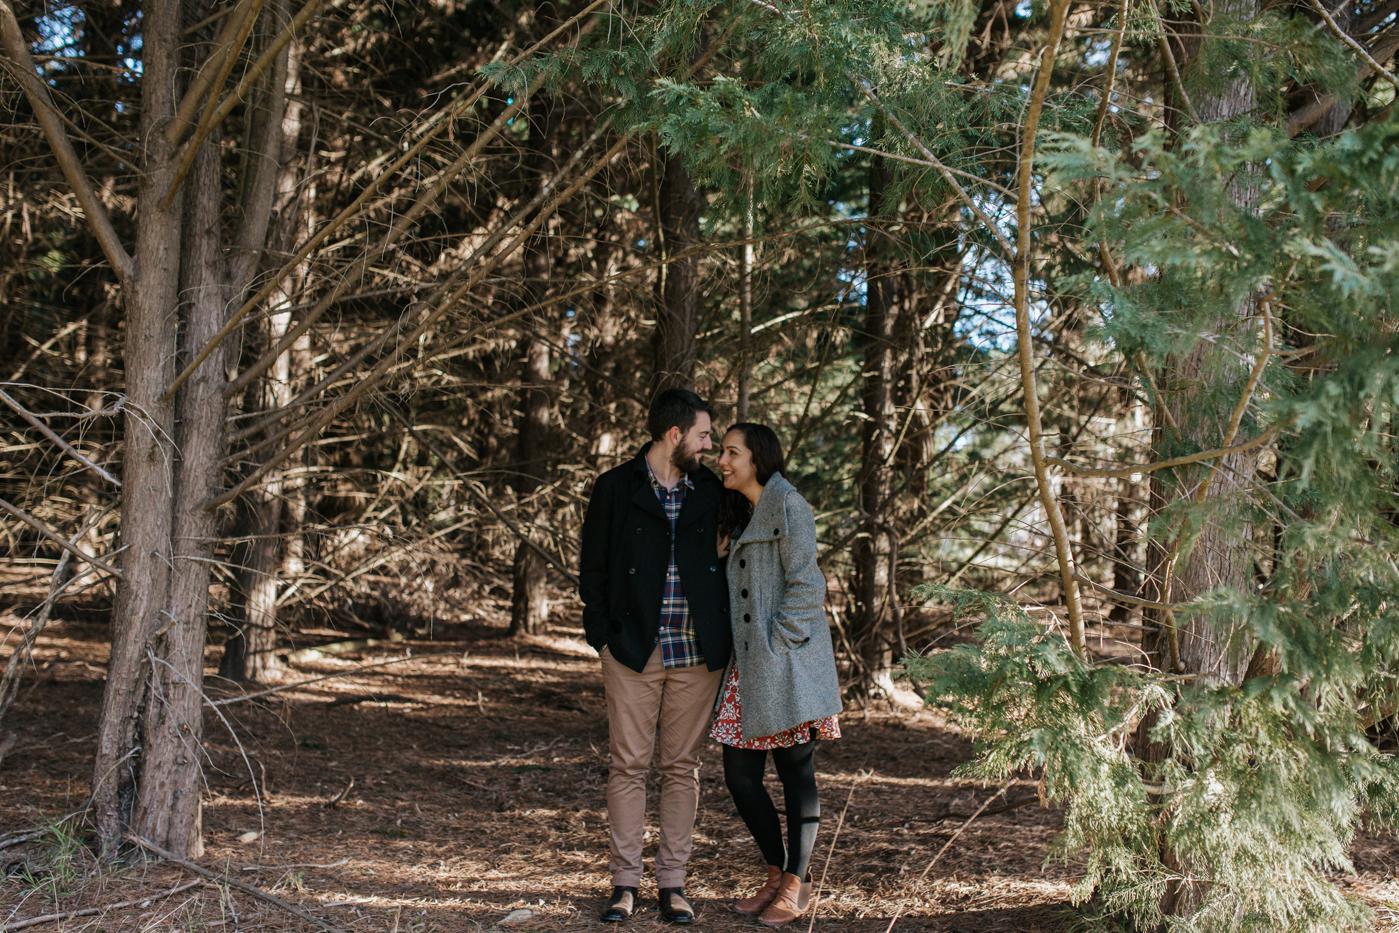 Kate & Kieran - Southern Highlands Engagement - Samantha Heather Photography-44.jpg